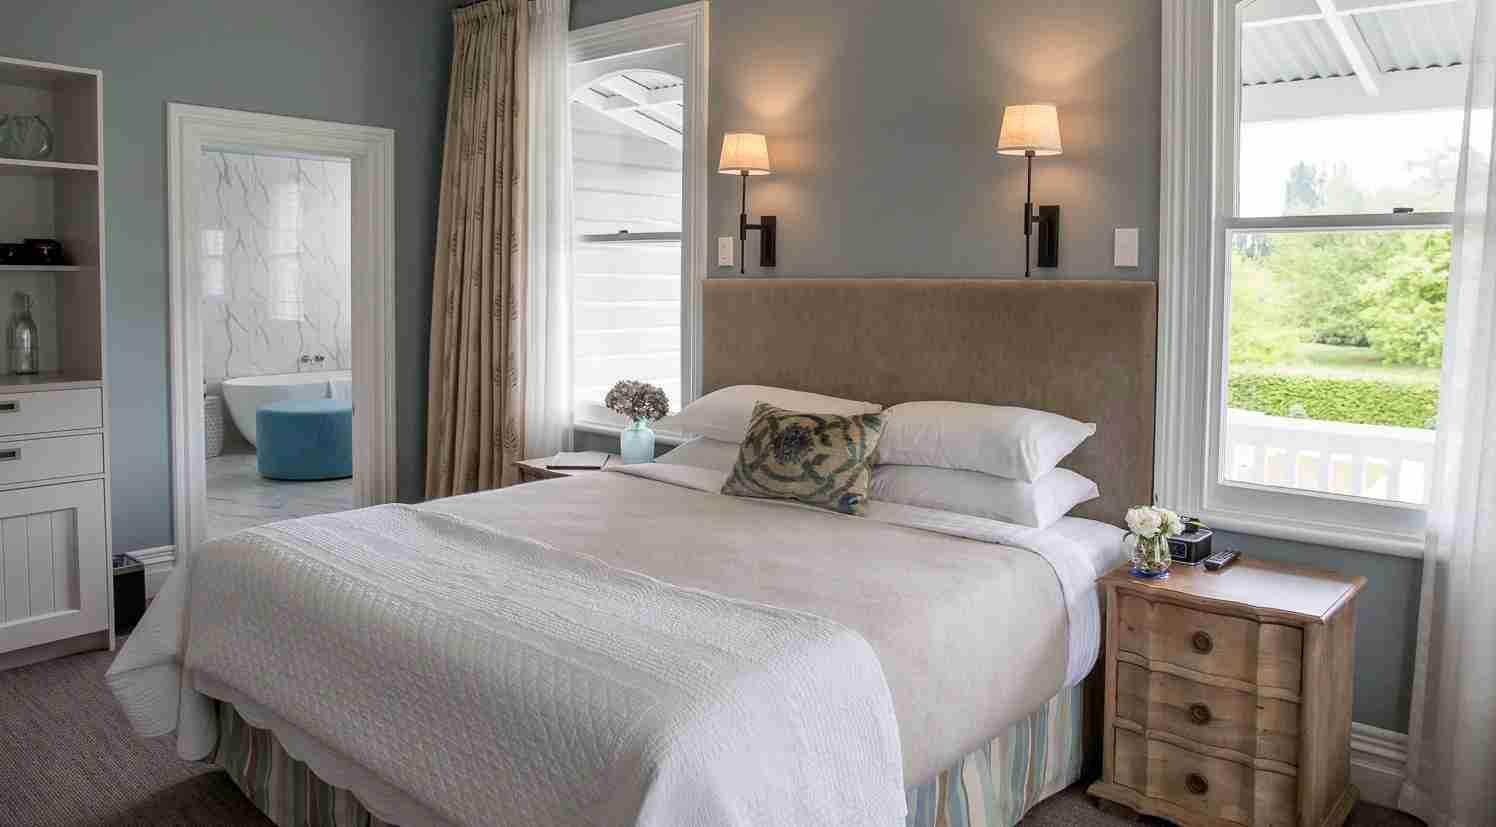 Splurge on a stay at the luxurious Marlborough Lodge. Photo courtesy of Marlborough Lodge.